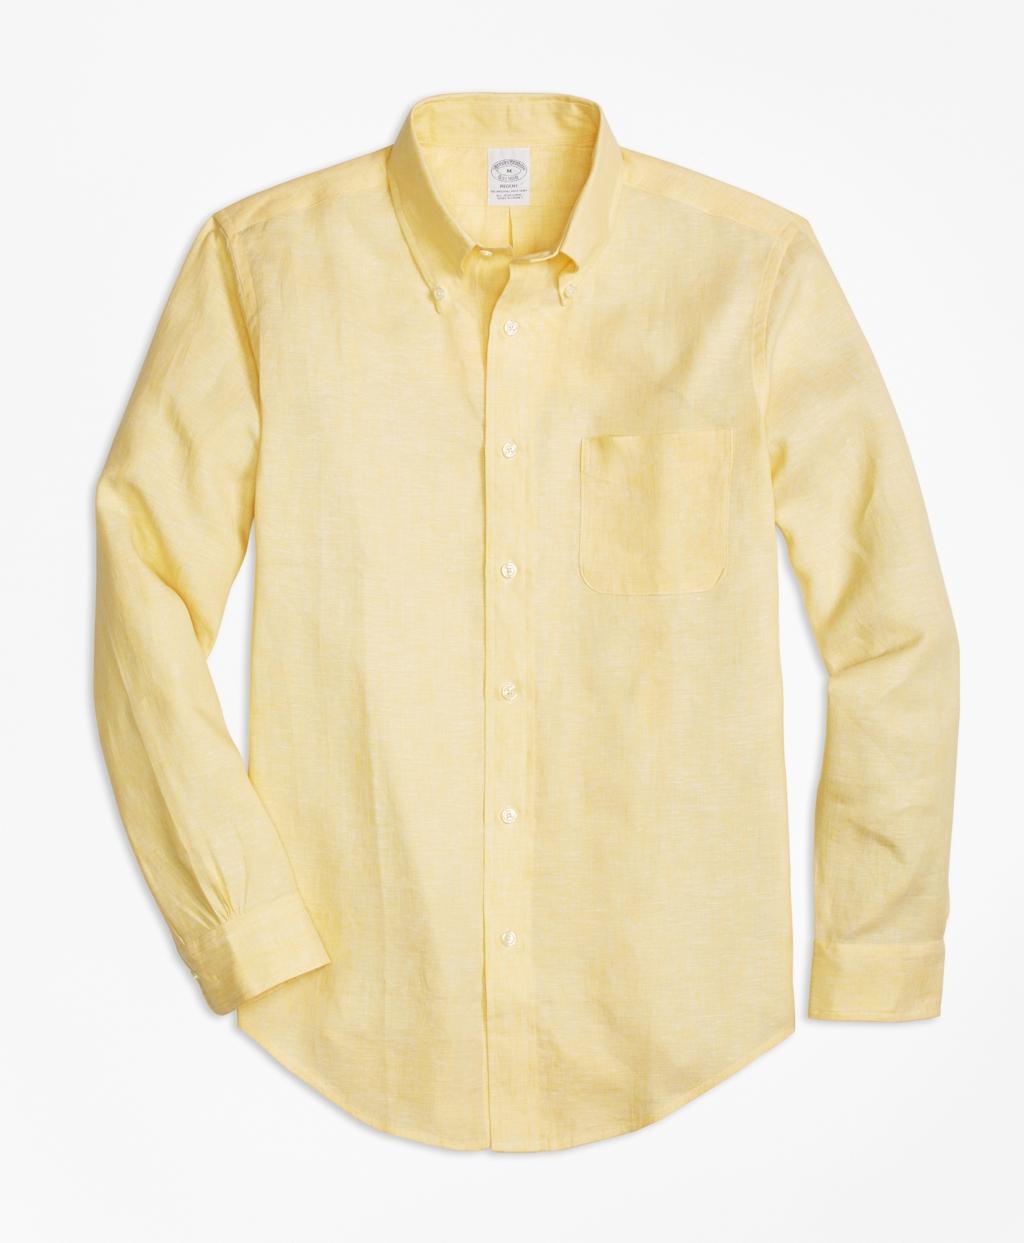 Brooks brothers regent fit irish linen sport shirt in for Irish linen dress shirts